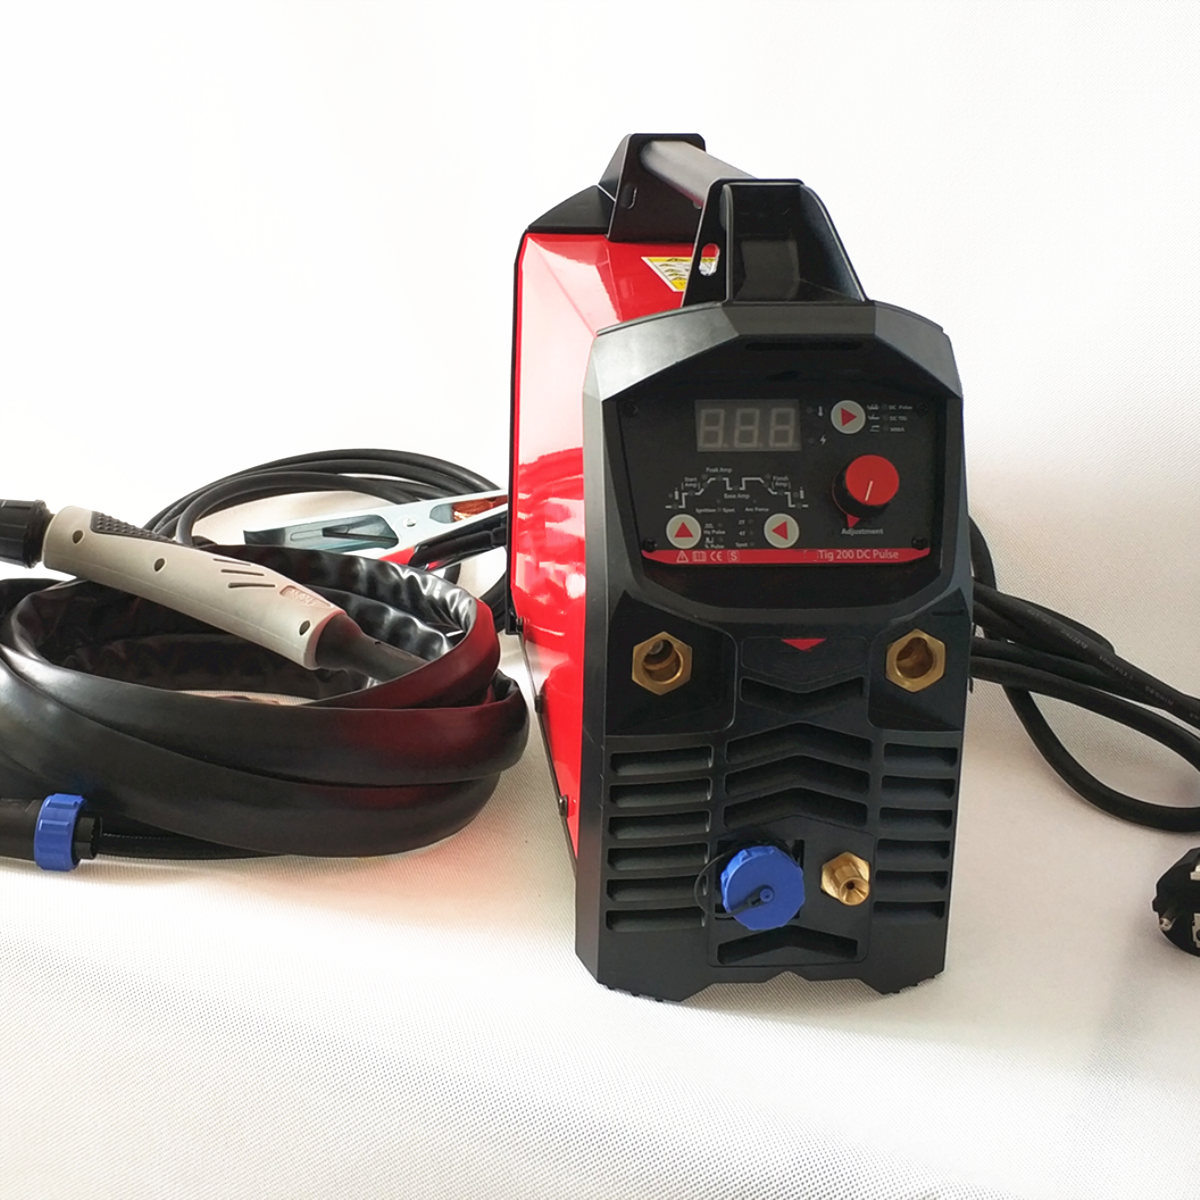 Professional Digital TIG 200A Pulse Welding Machine Hot Start HF Ignition Anti Stick Arc Force CE IGBT Inverter MMA TIG Weldertig 200ainverter welderwelding machine -